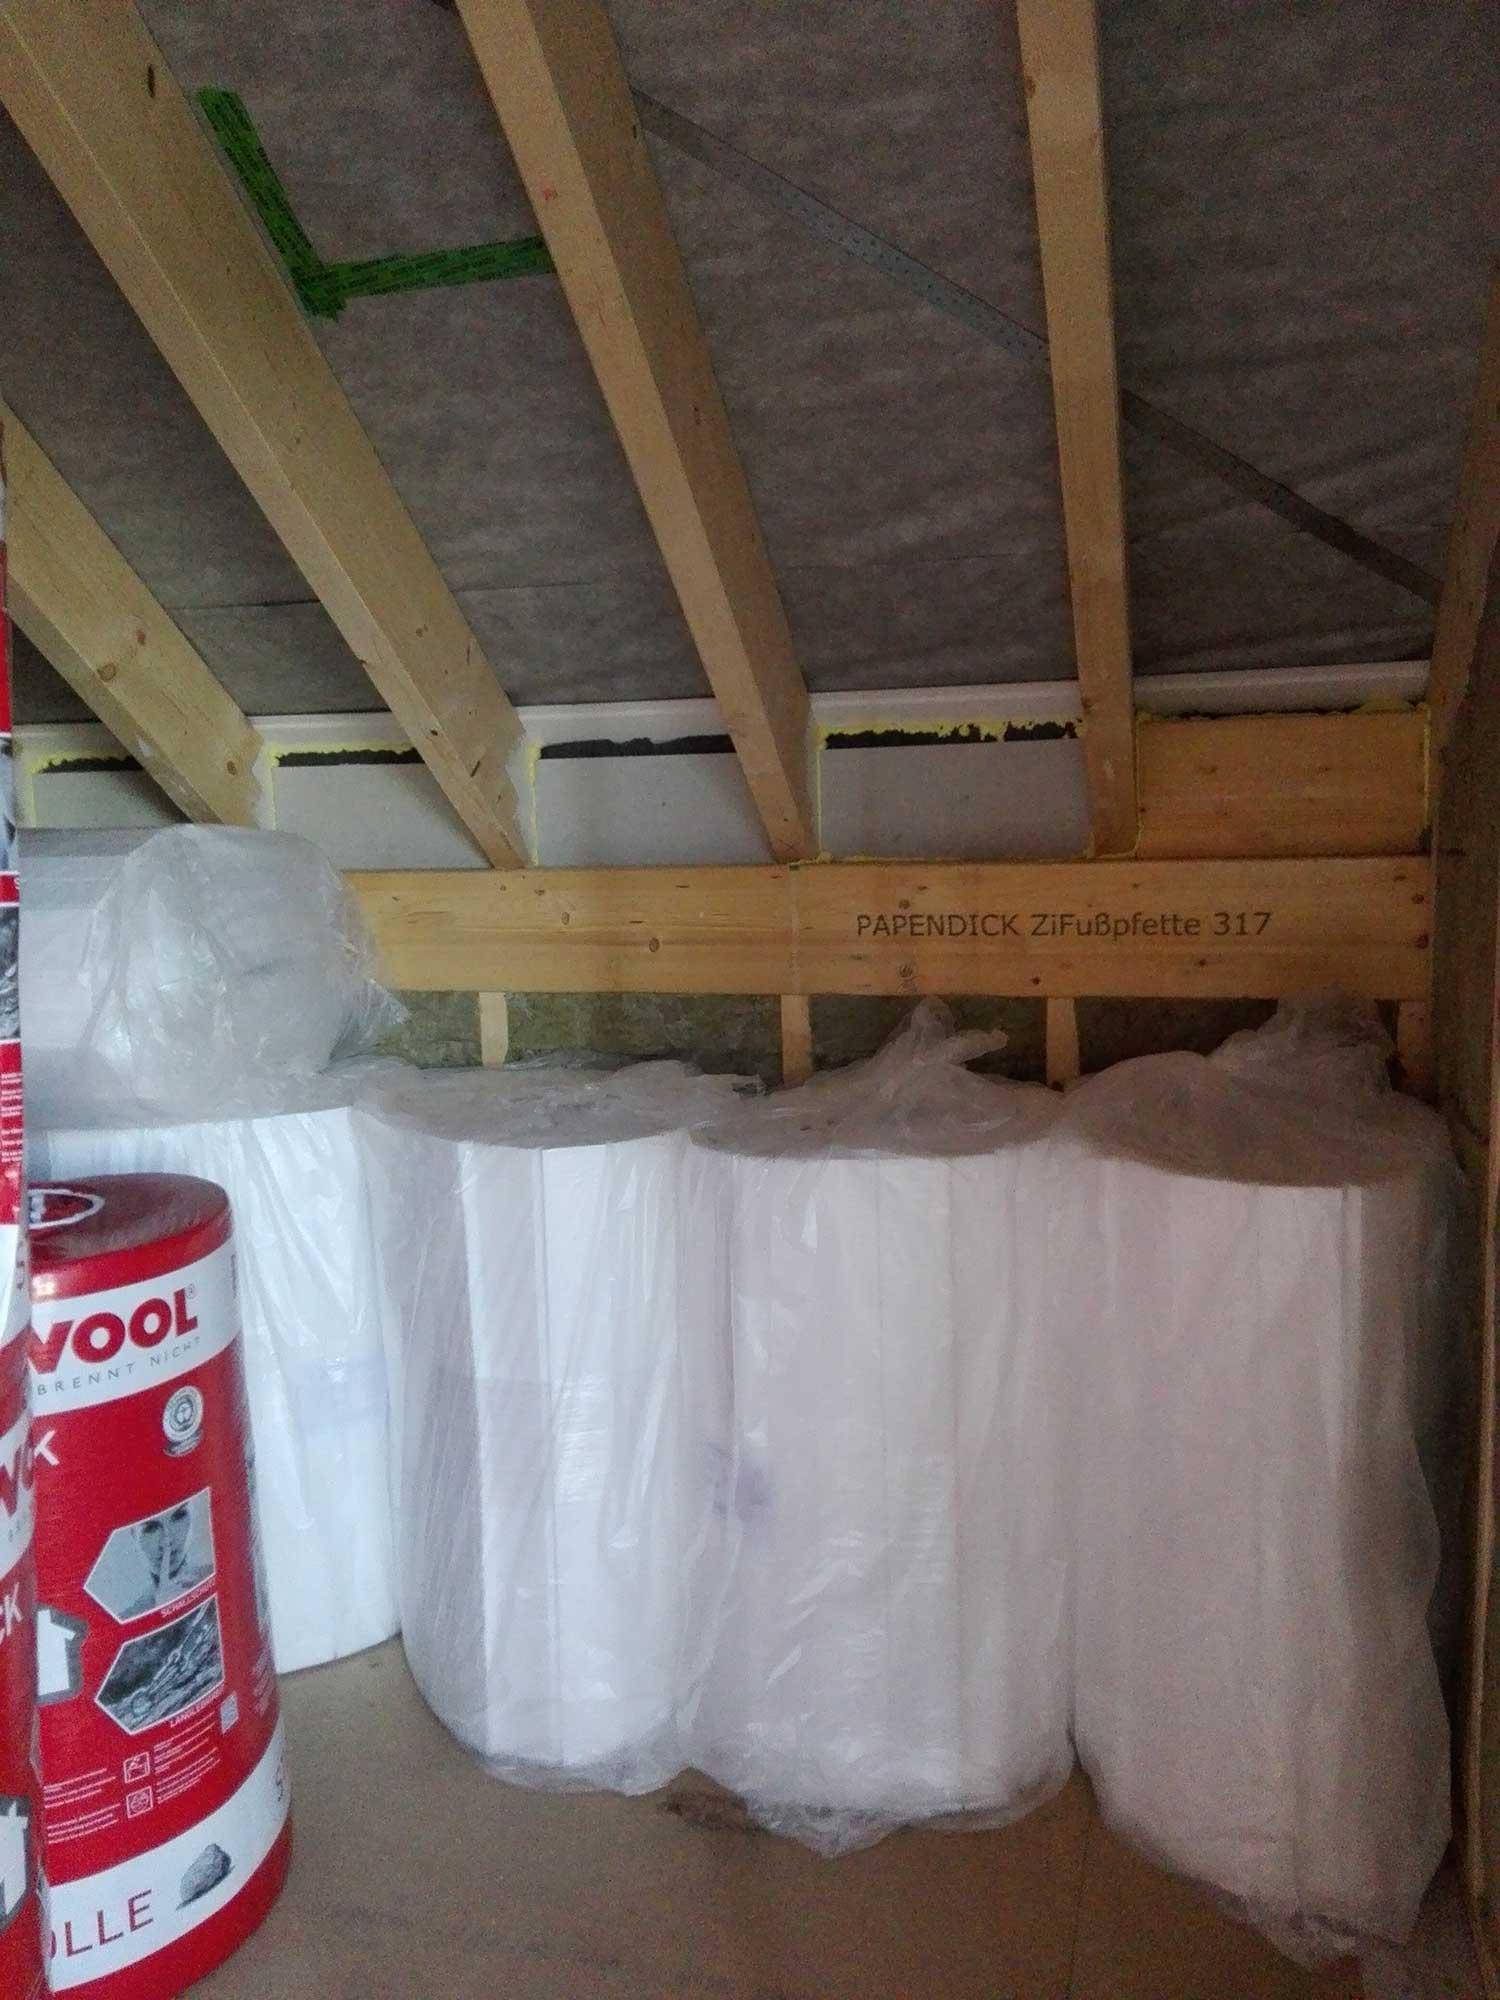 ausbaumaterial prumenb ls hausbau. Black Bedroom Furniture Sets. Home Design Ideas